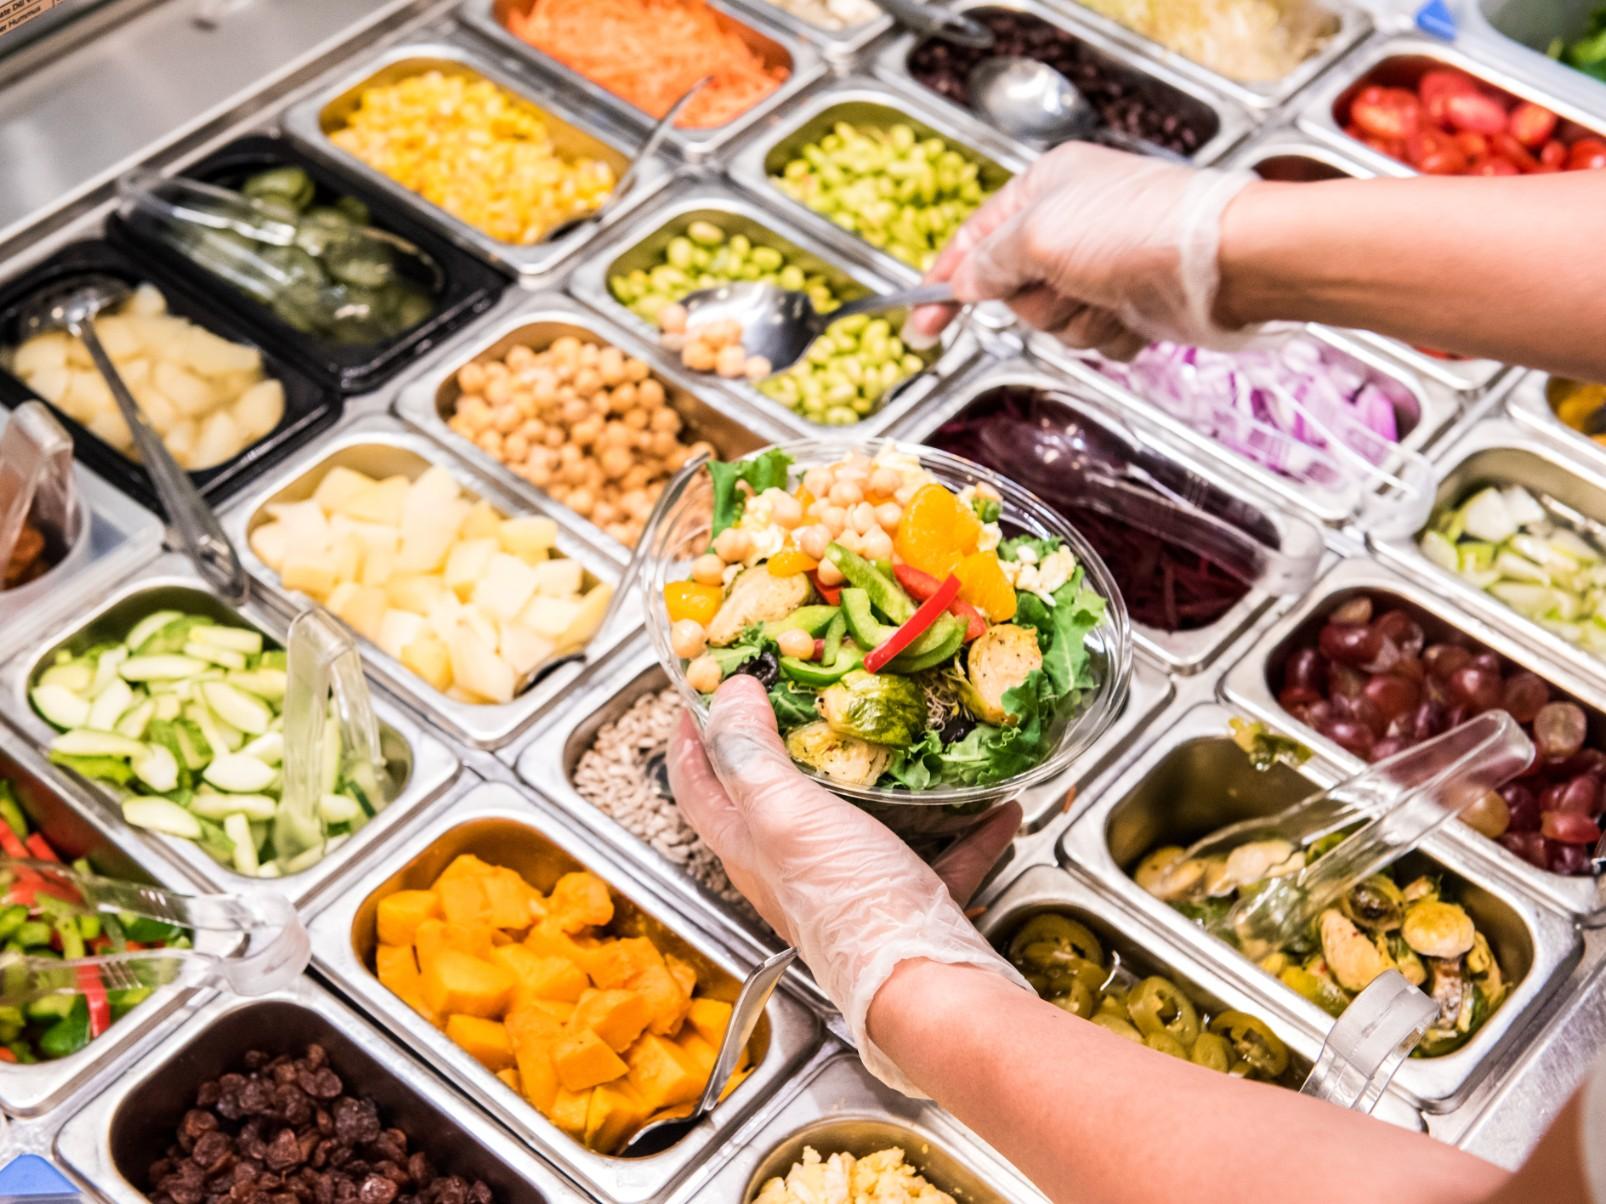 SaladStop! (Great World City) - Dine, Shop, Earn